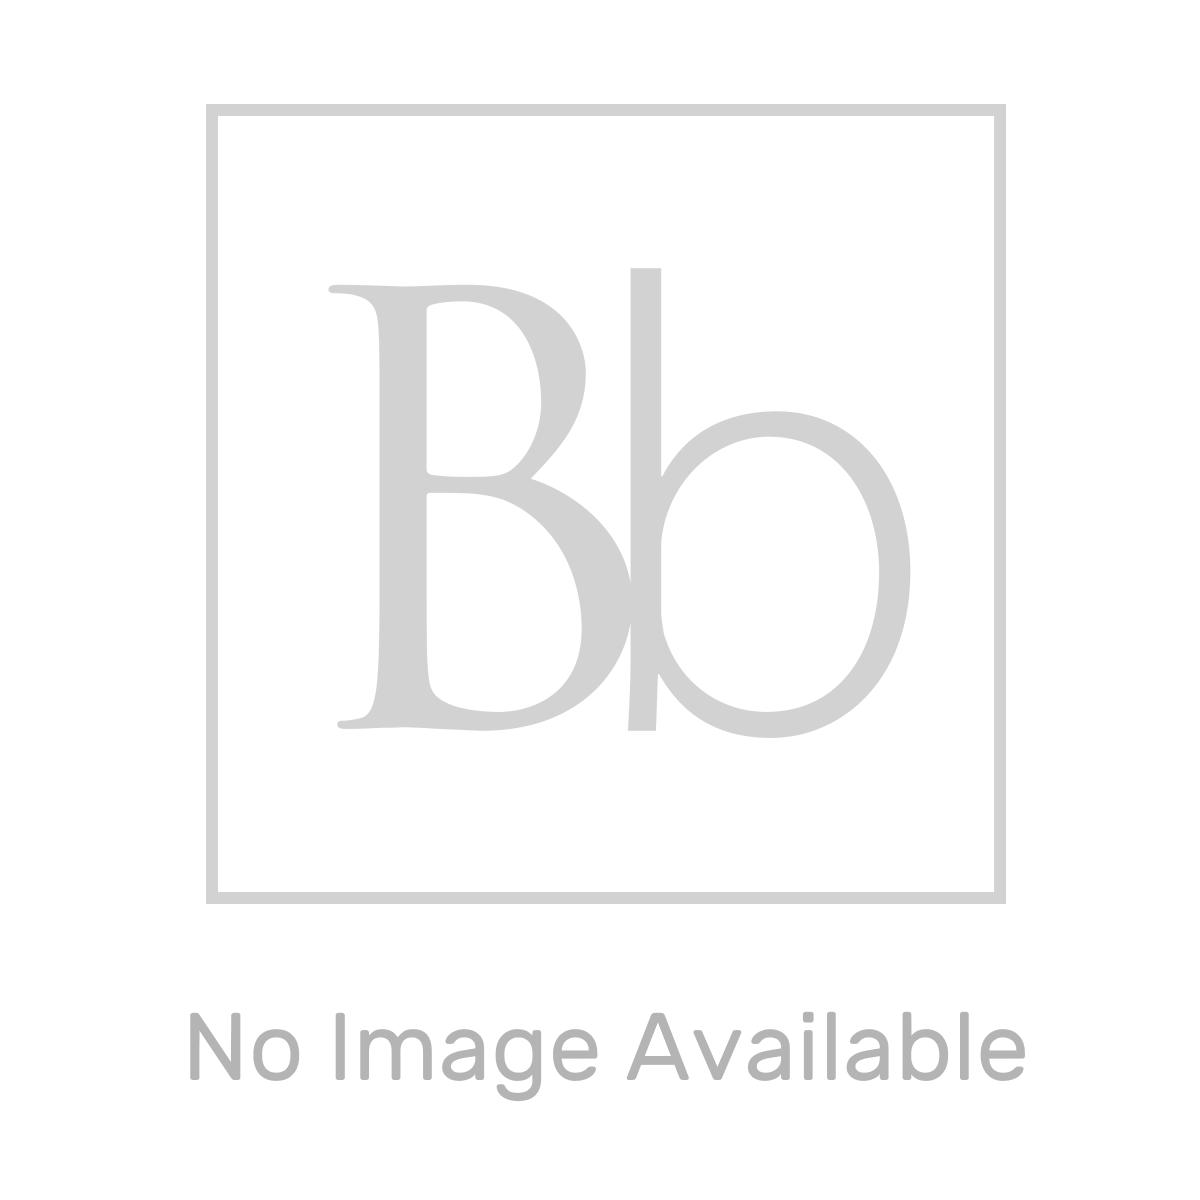 Ikoma White Gloss Vanity Unit with Basin 450mm Overhead